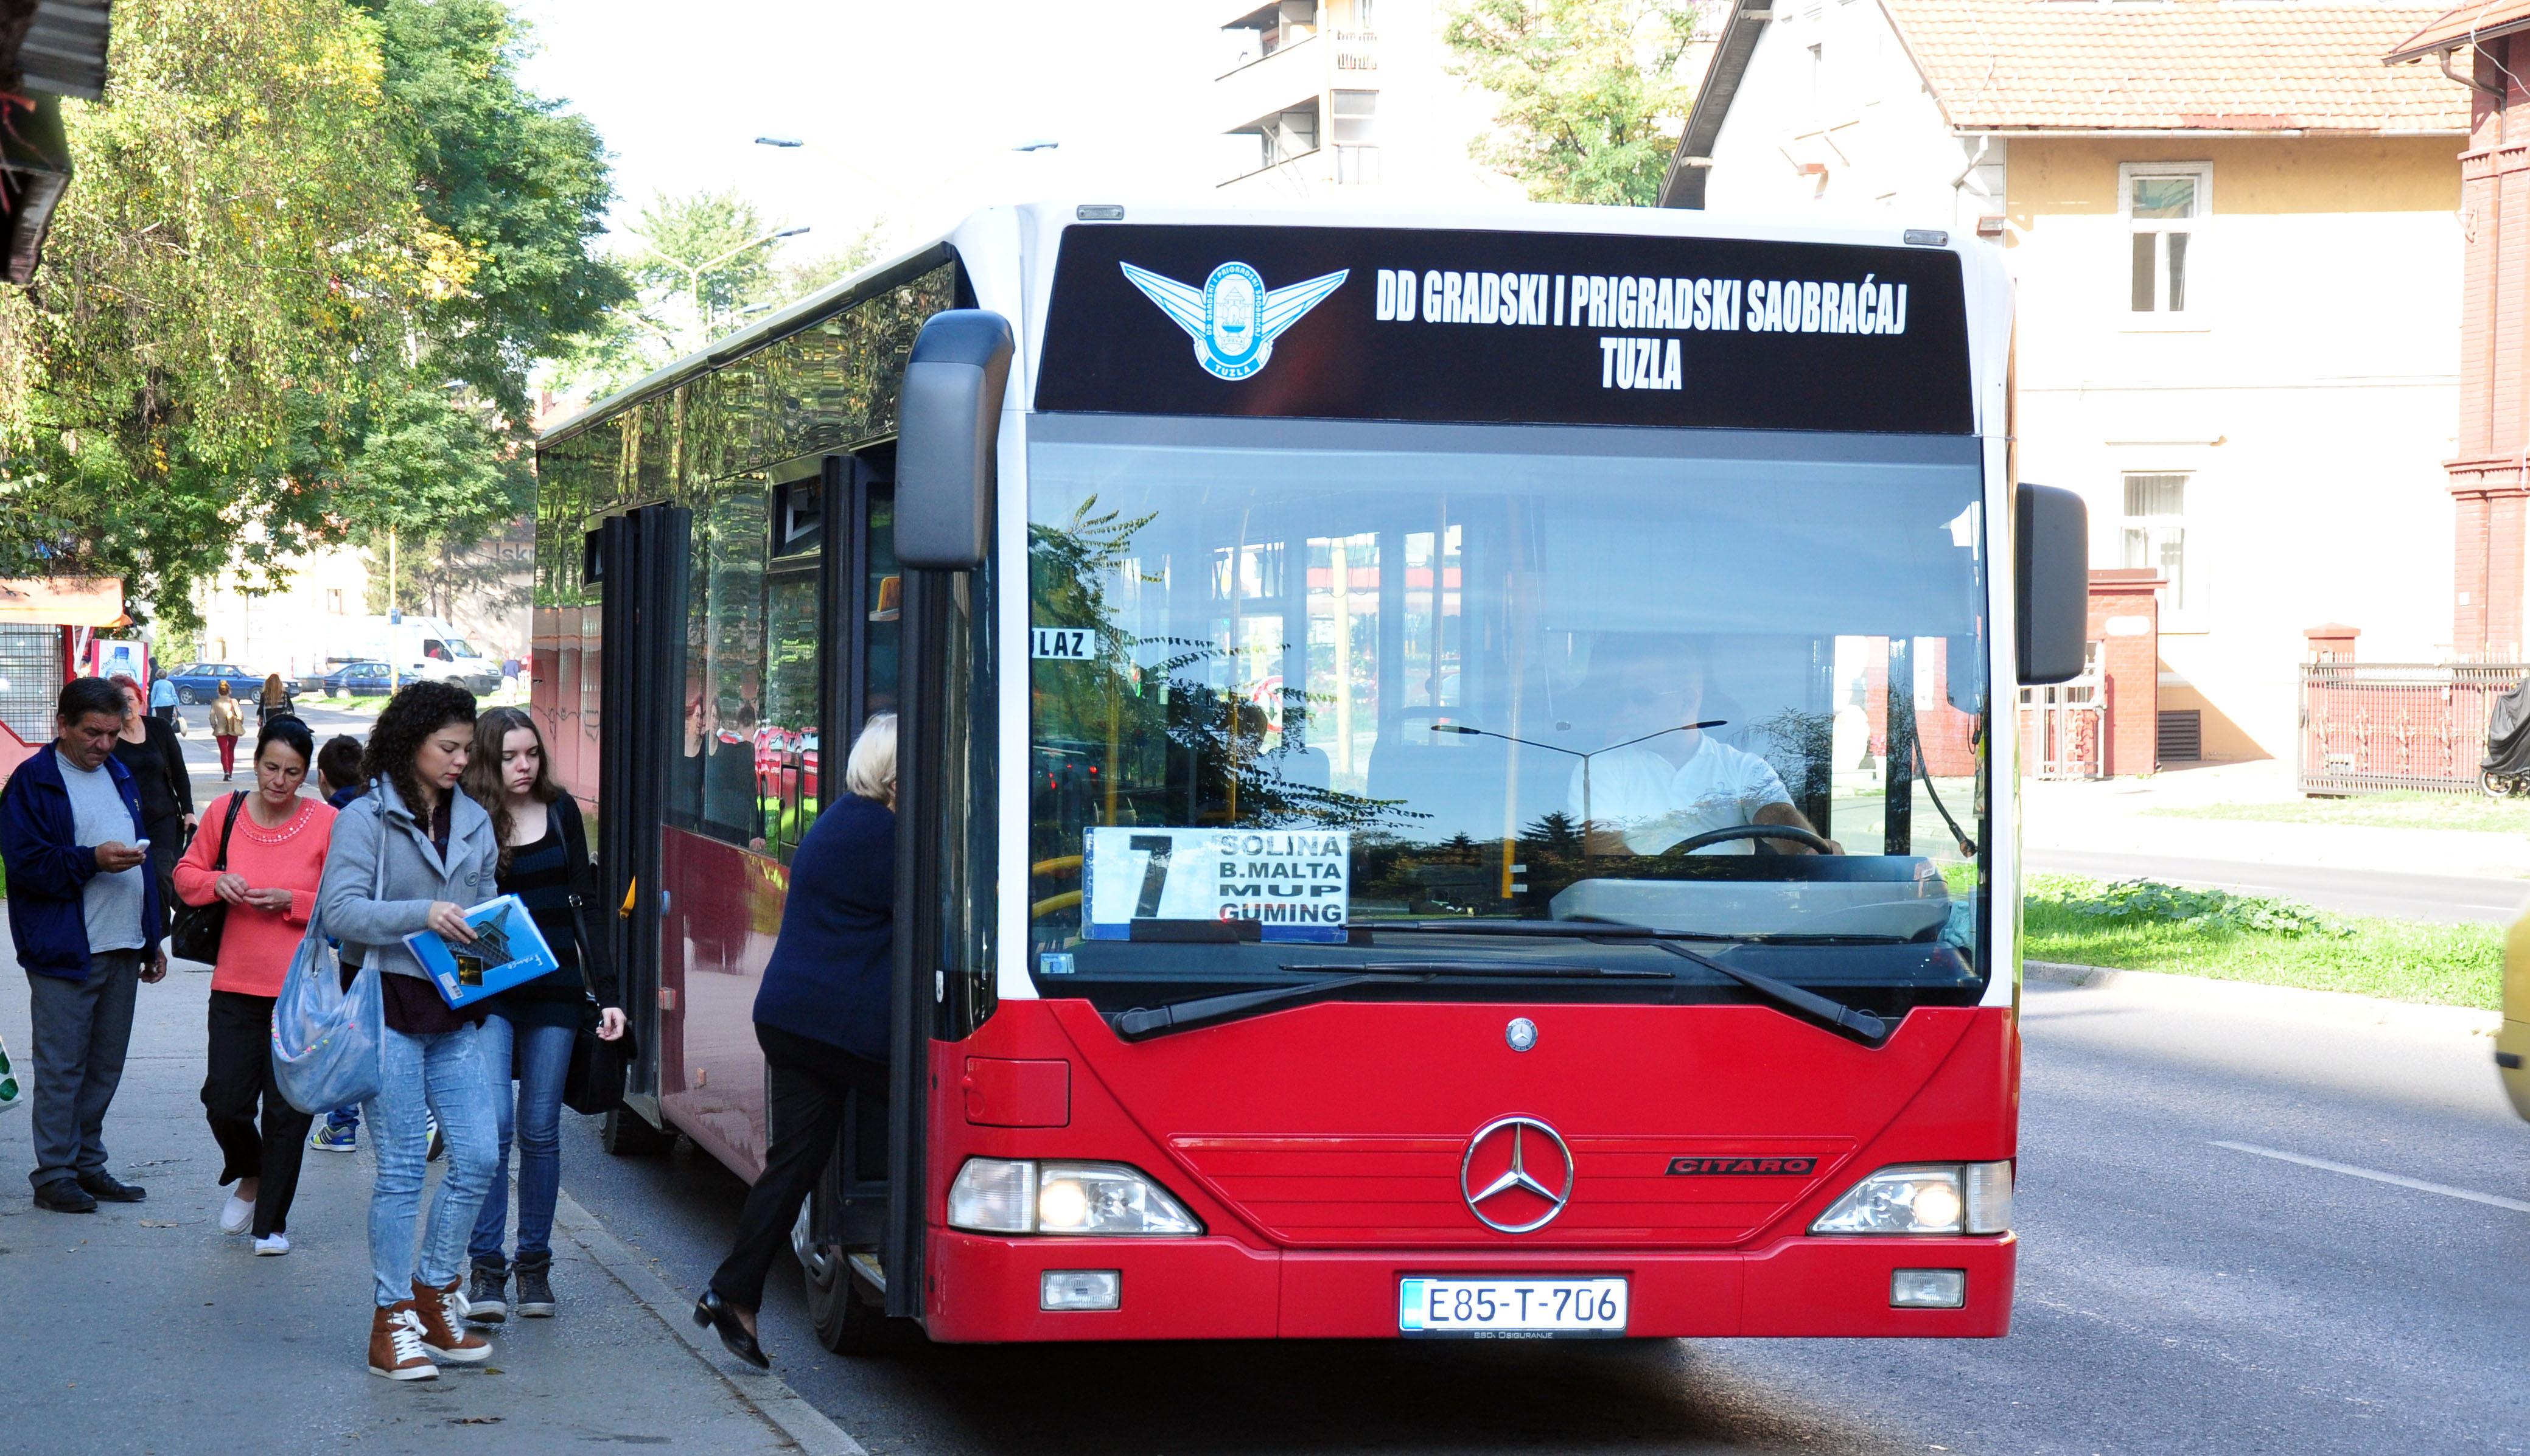 https://www.gipstk.com/wp-content/uploads/2014/10/Autobus-82.jpg